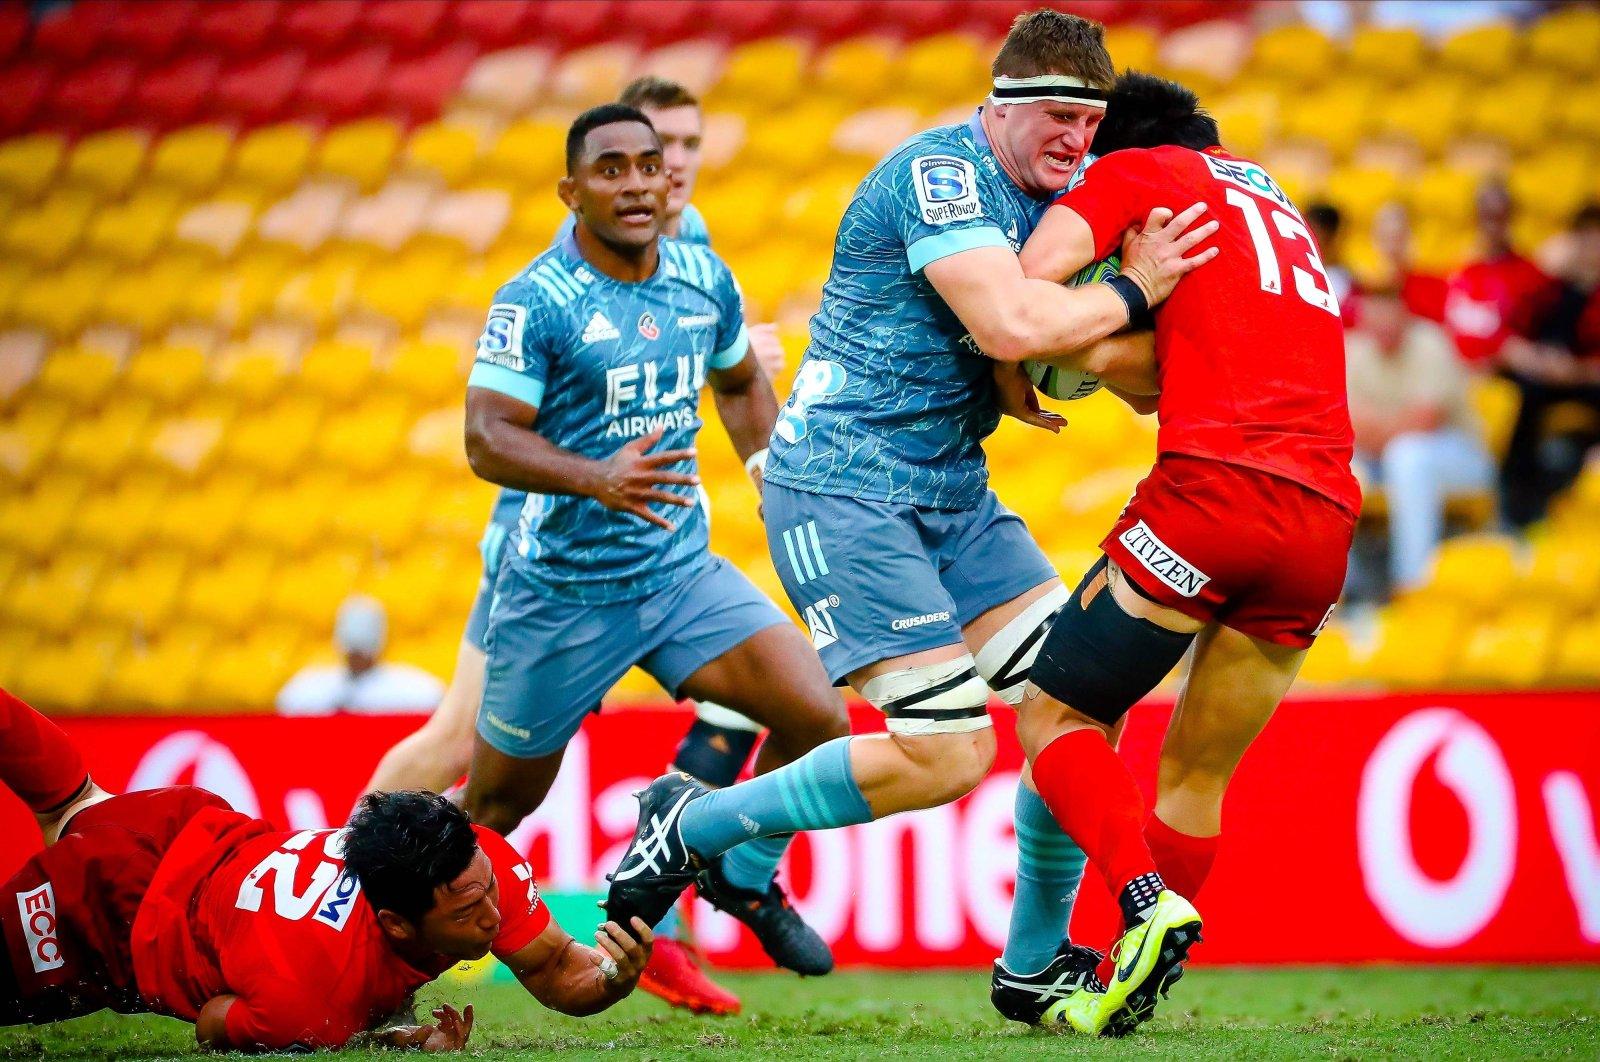 Crusaders' Tom Sanders is tackled by Sunwolves' Shogo Nakano (L) and Keisuke Moriya (R) during the Super Rugby match between Sunwolves and Crusaders, in Brisbane, Australia, March 14, 2020. (AFP Photo)